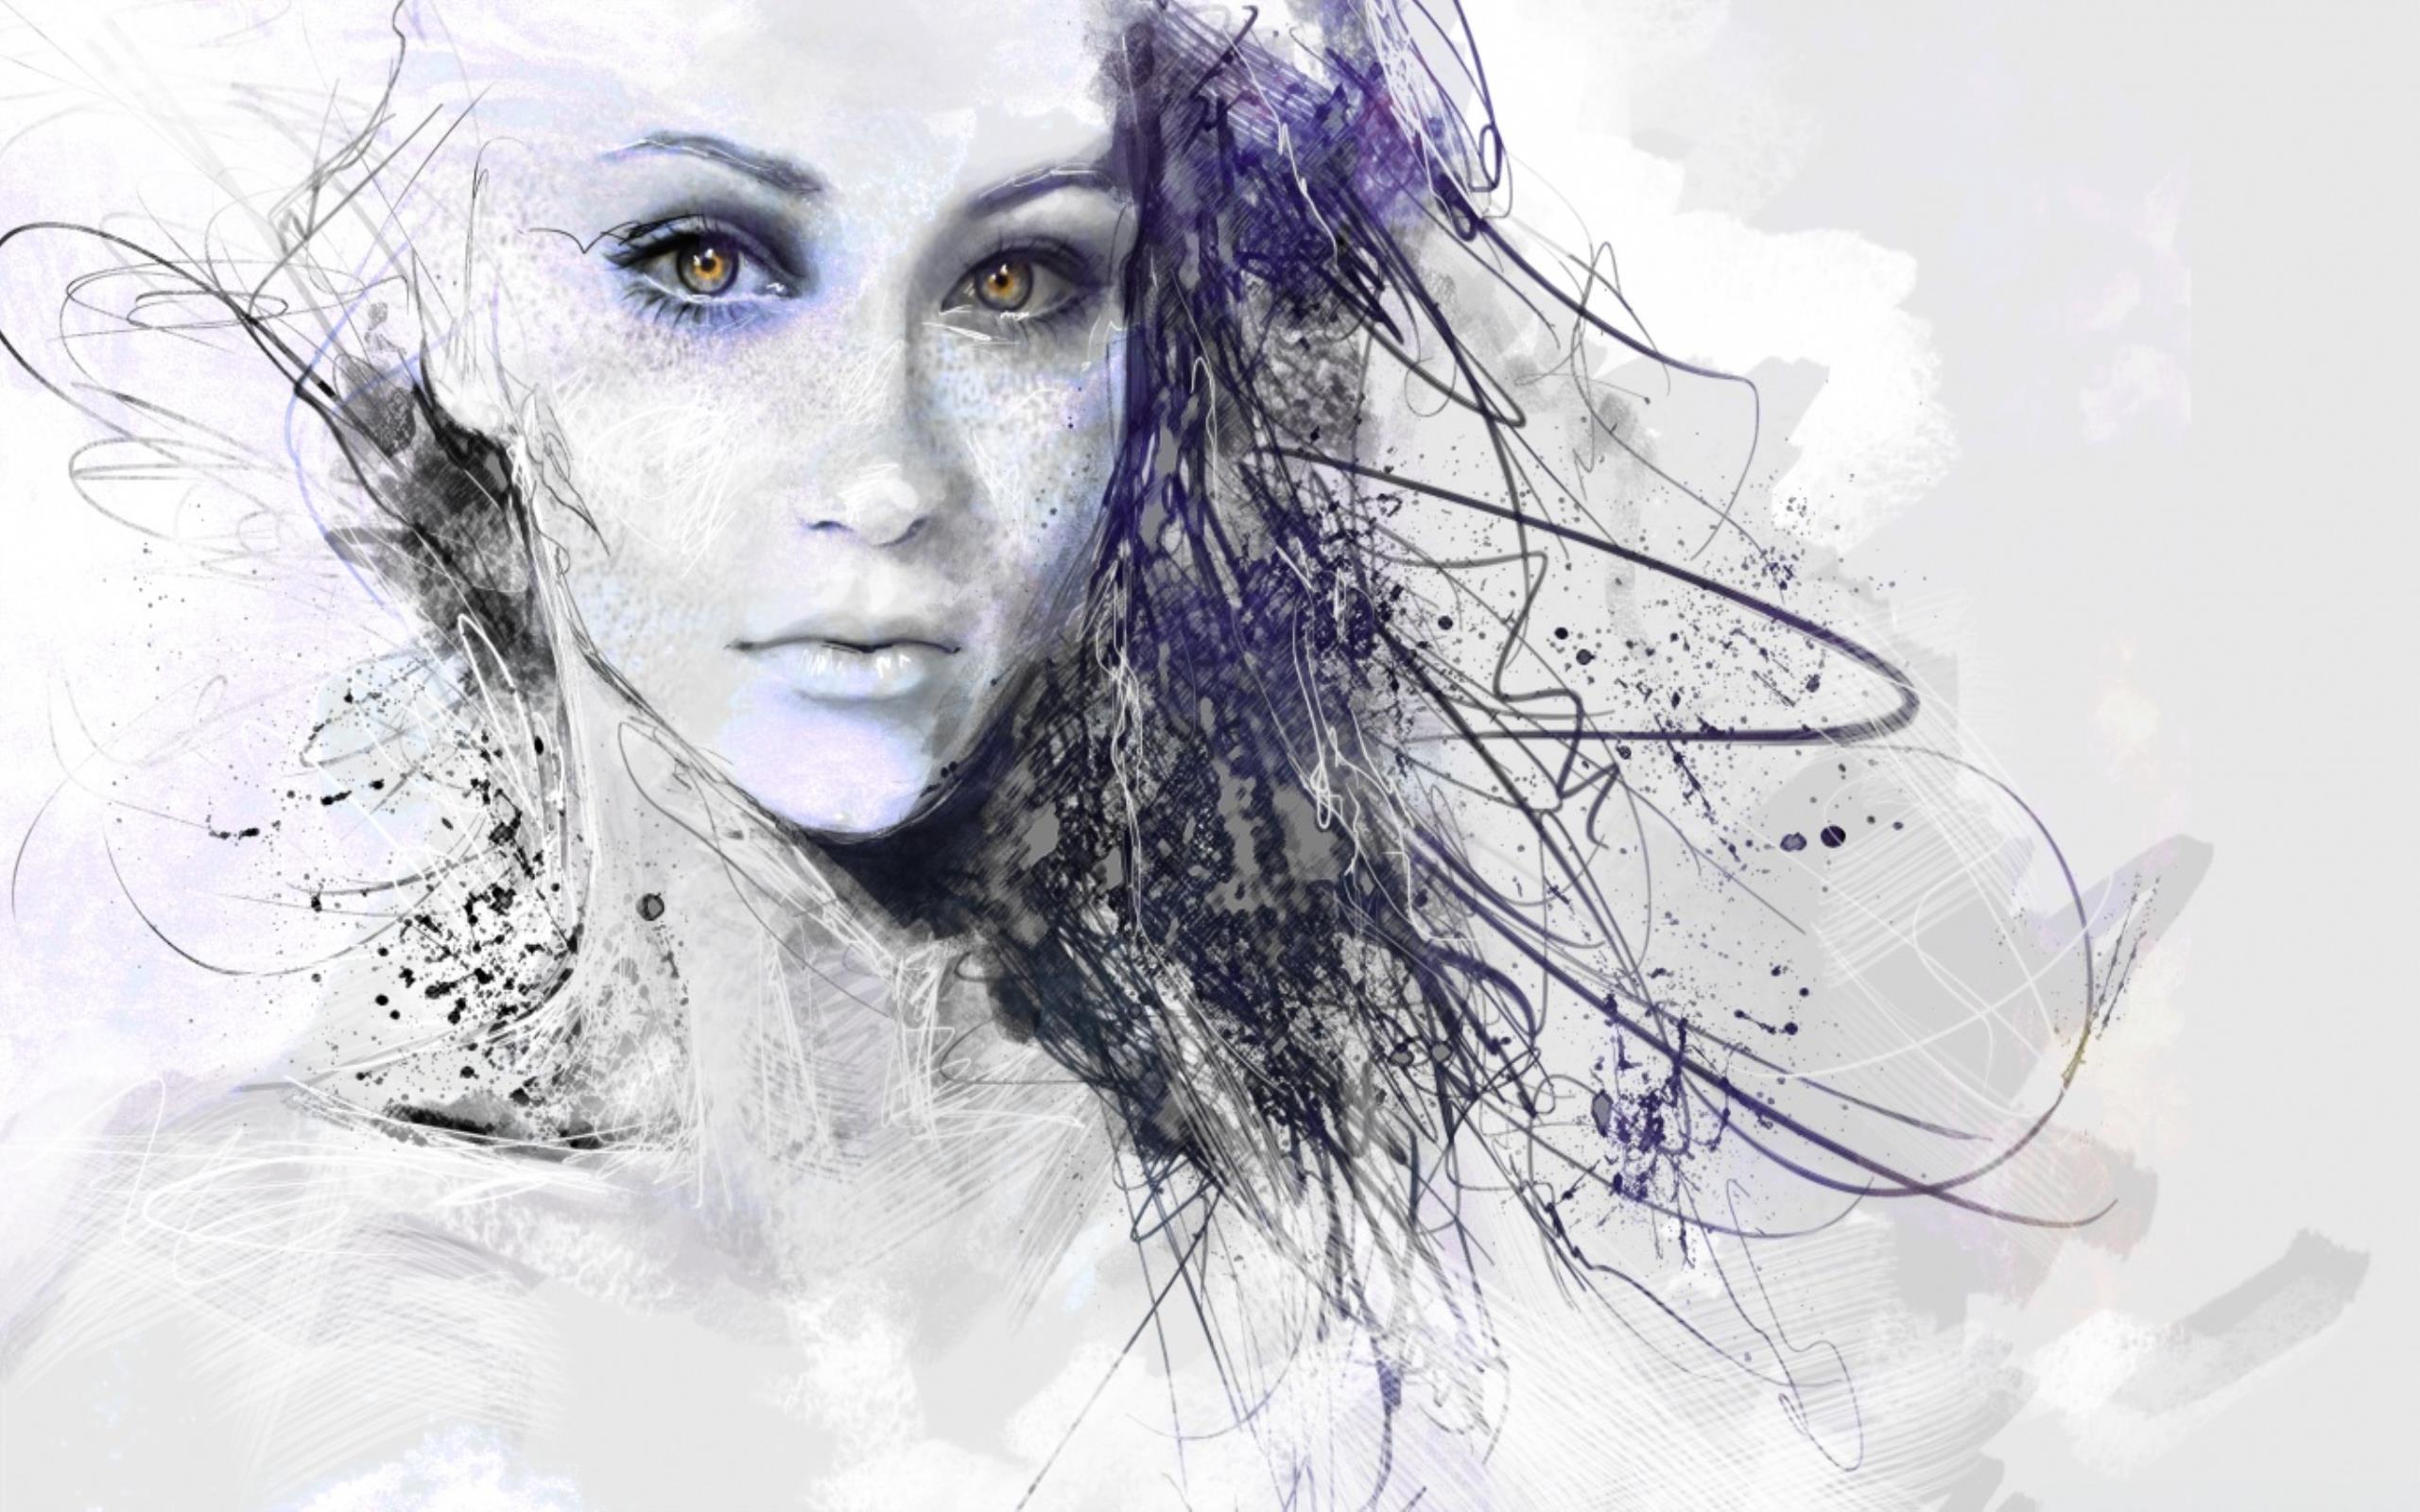 Girl Drawing Art Wallpaper | HD Wallpapers